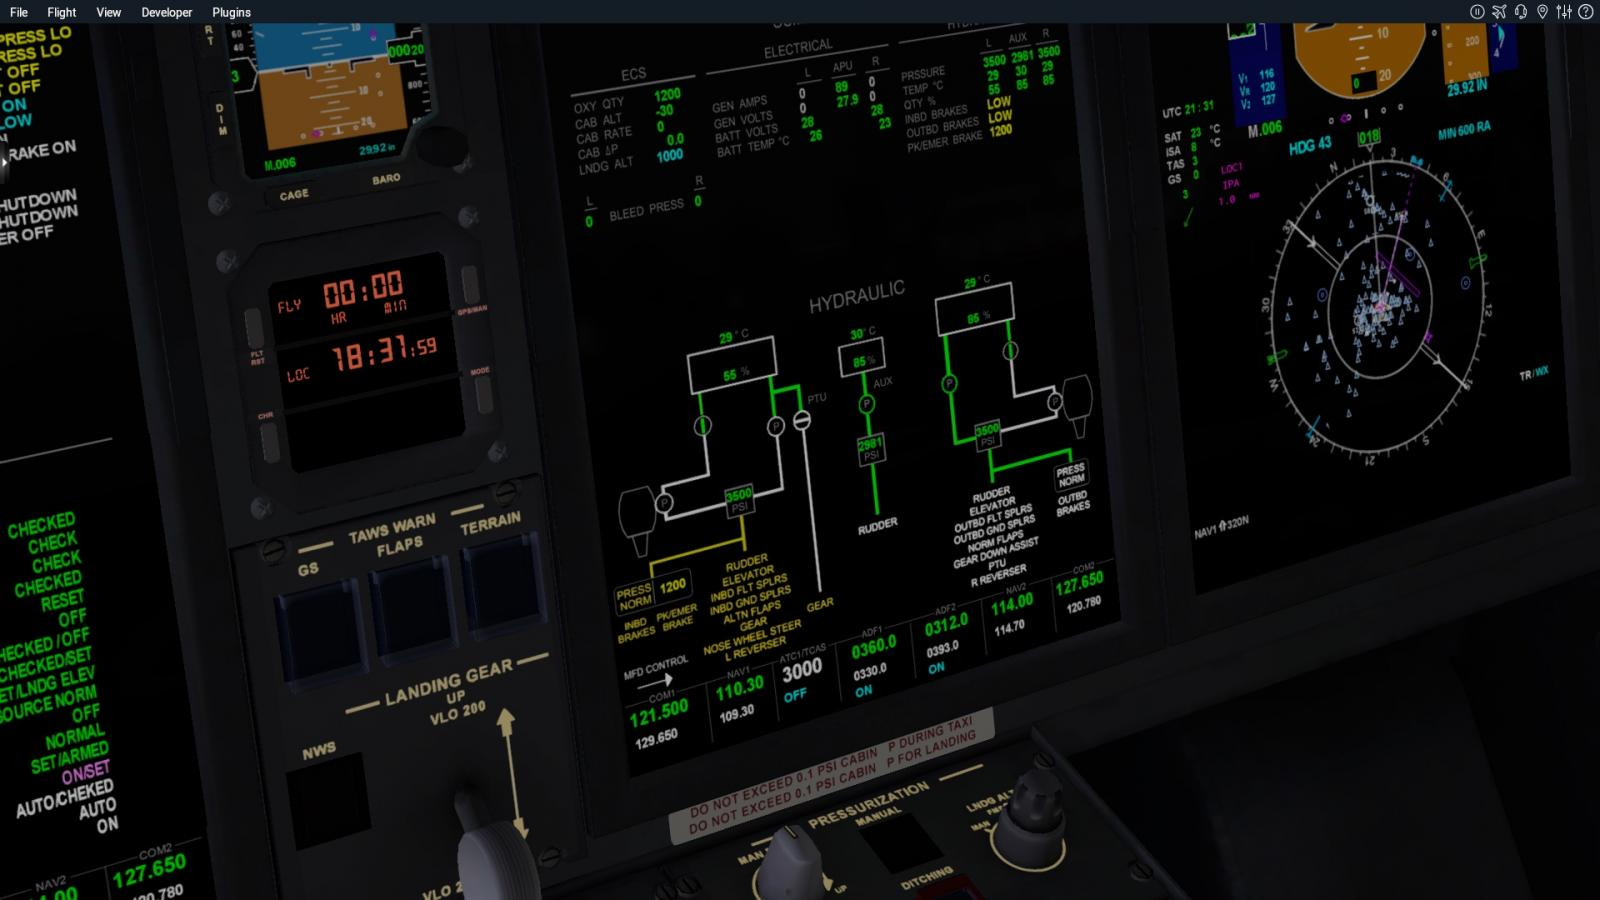 Bombardier_Cl_300_1.thumb.jpg.d40abac30a8dccae2d8a278e5abb145b.jpg